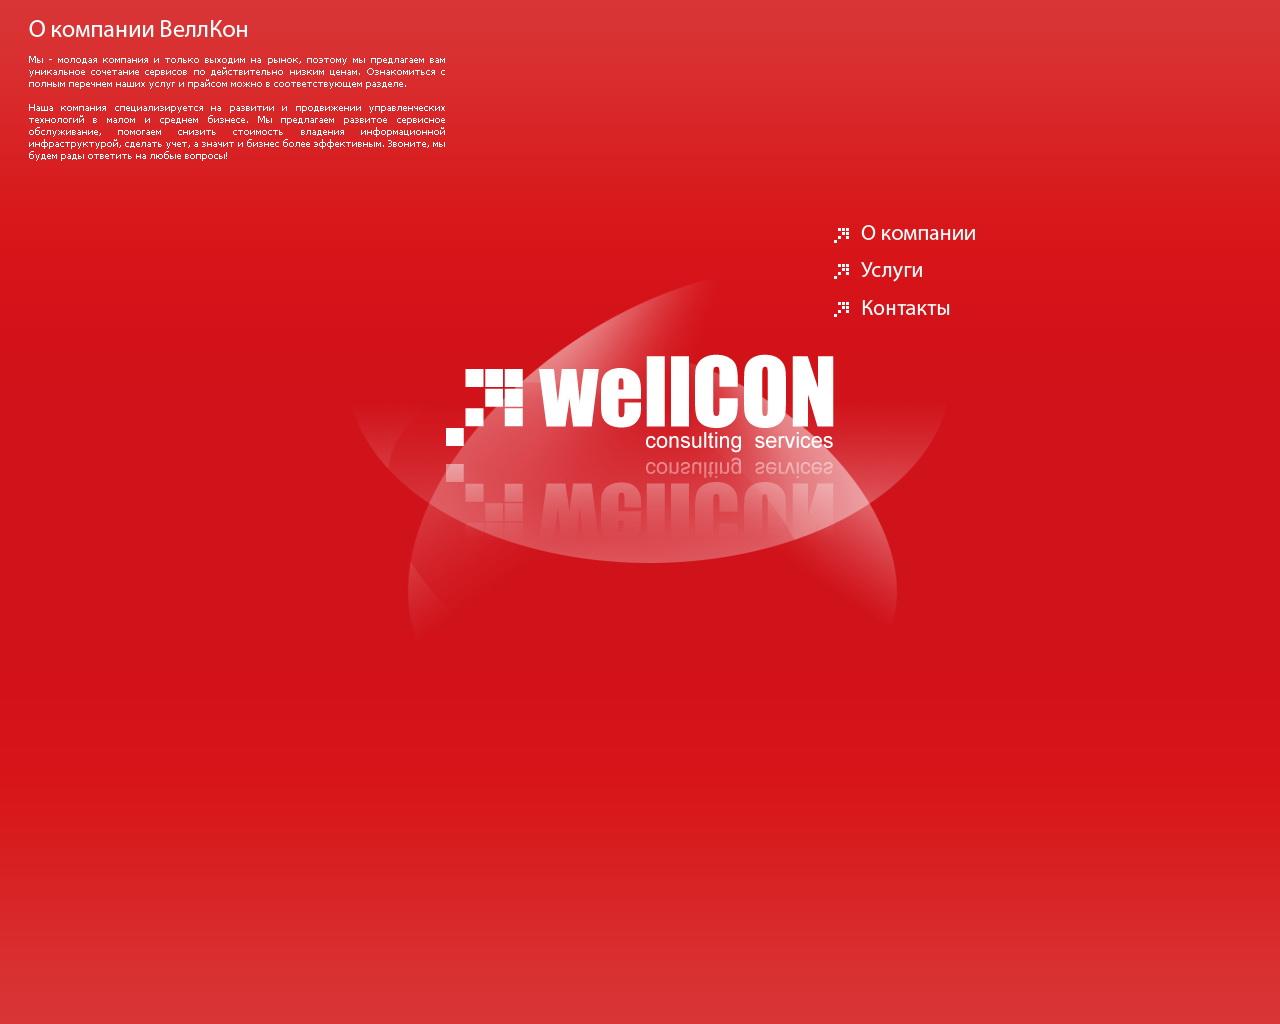 Wellcon